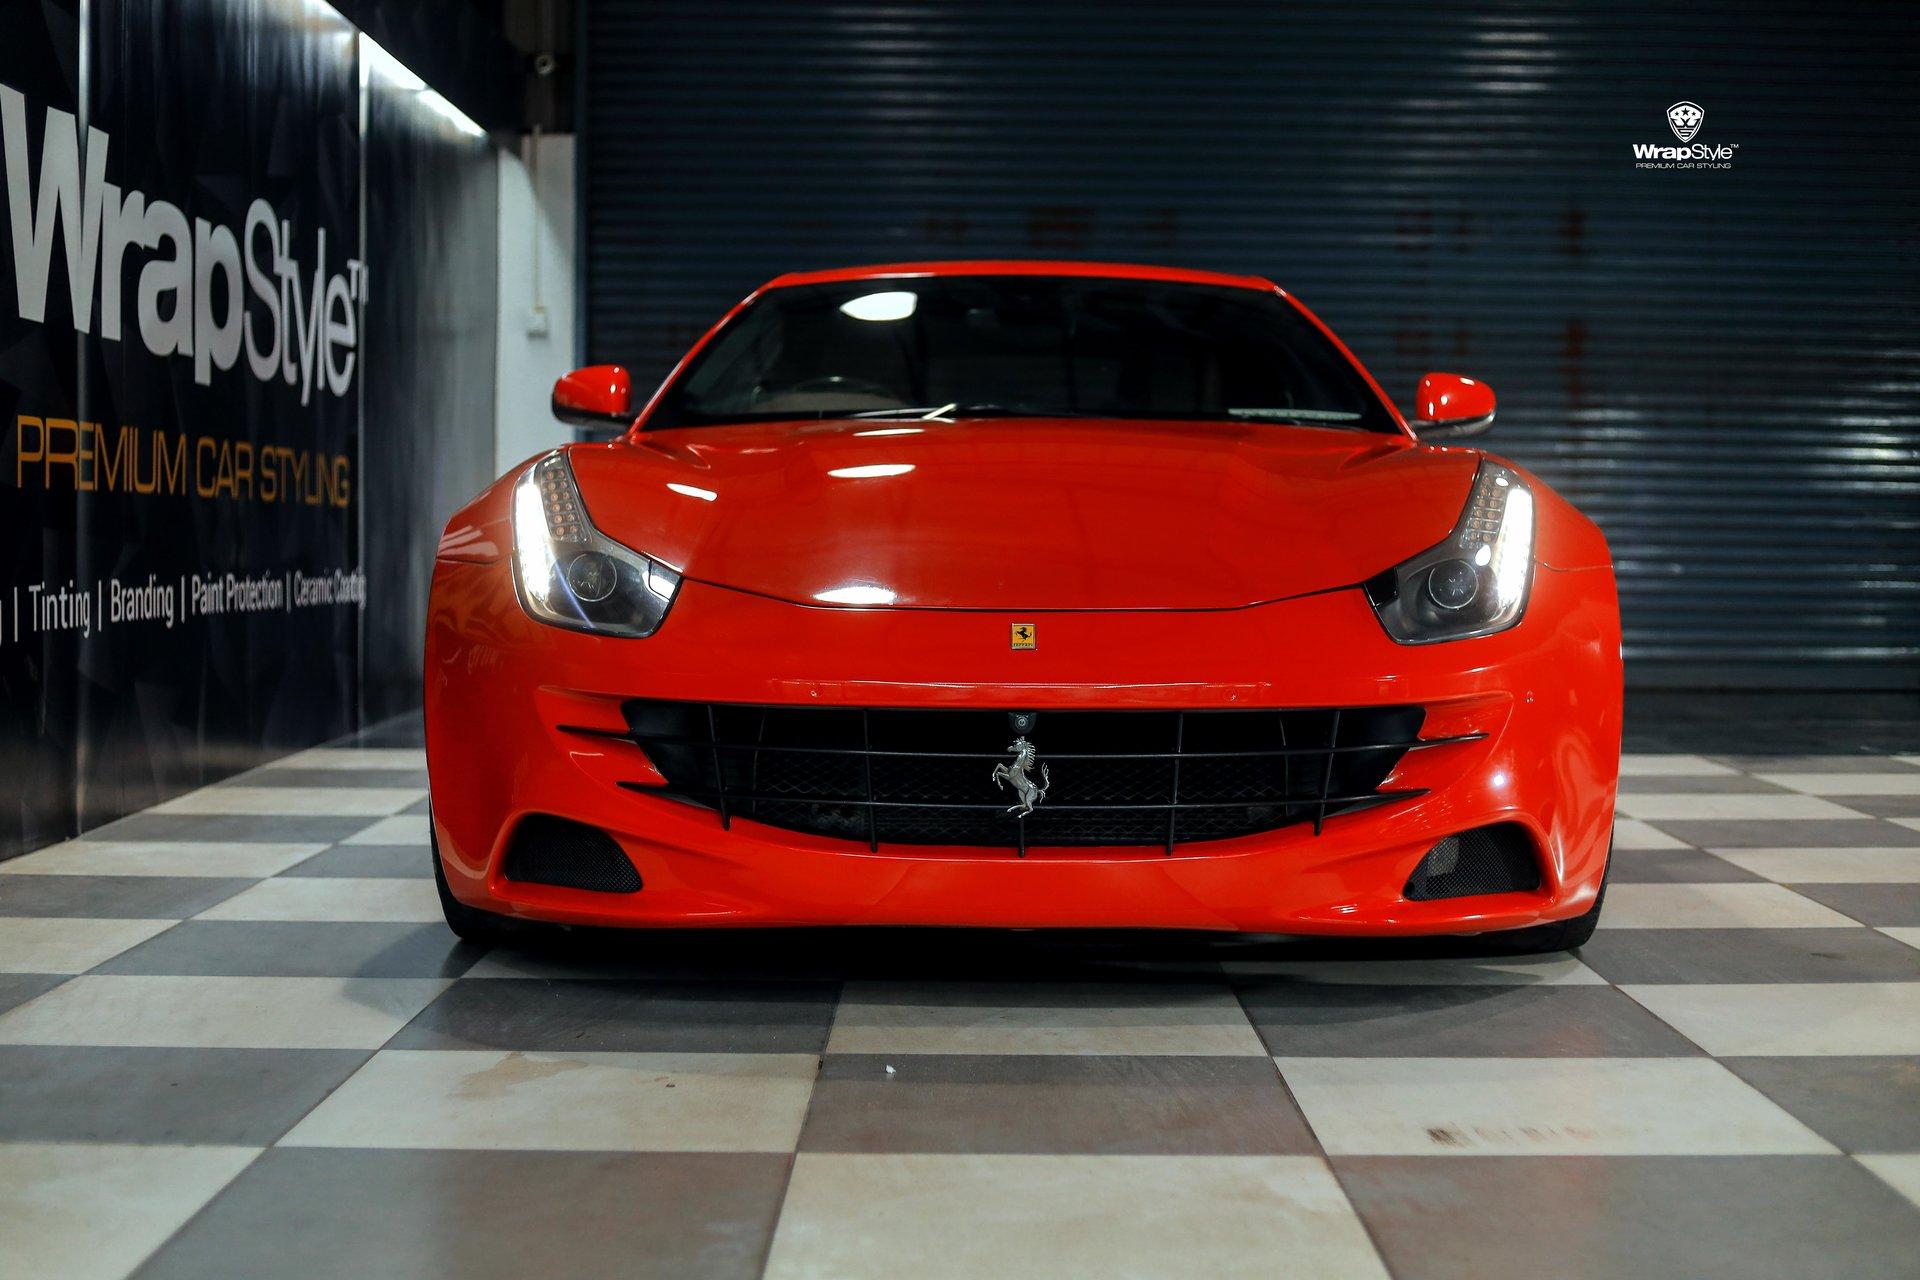 Ferrari Gtc4 Lusso V12 Red Gloss Wrap Wrapstyle